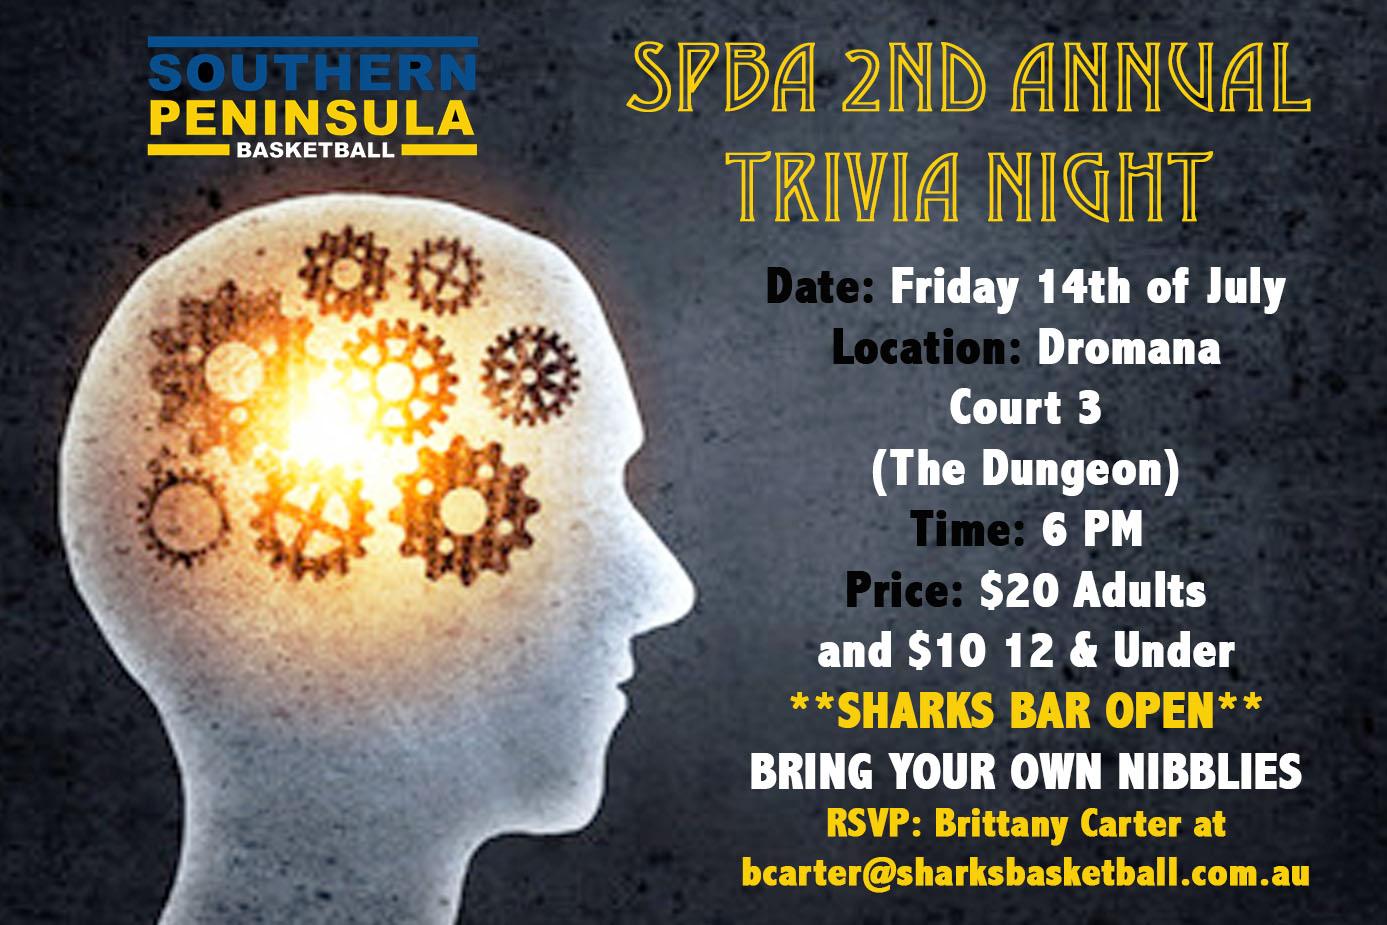 SPBA 2nd Annual Trivia Night